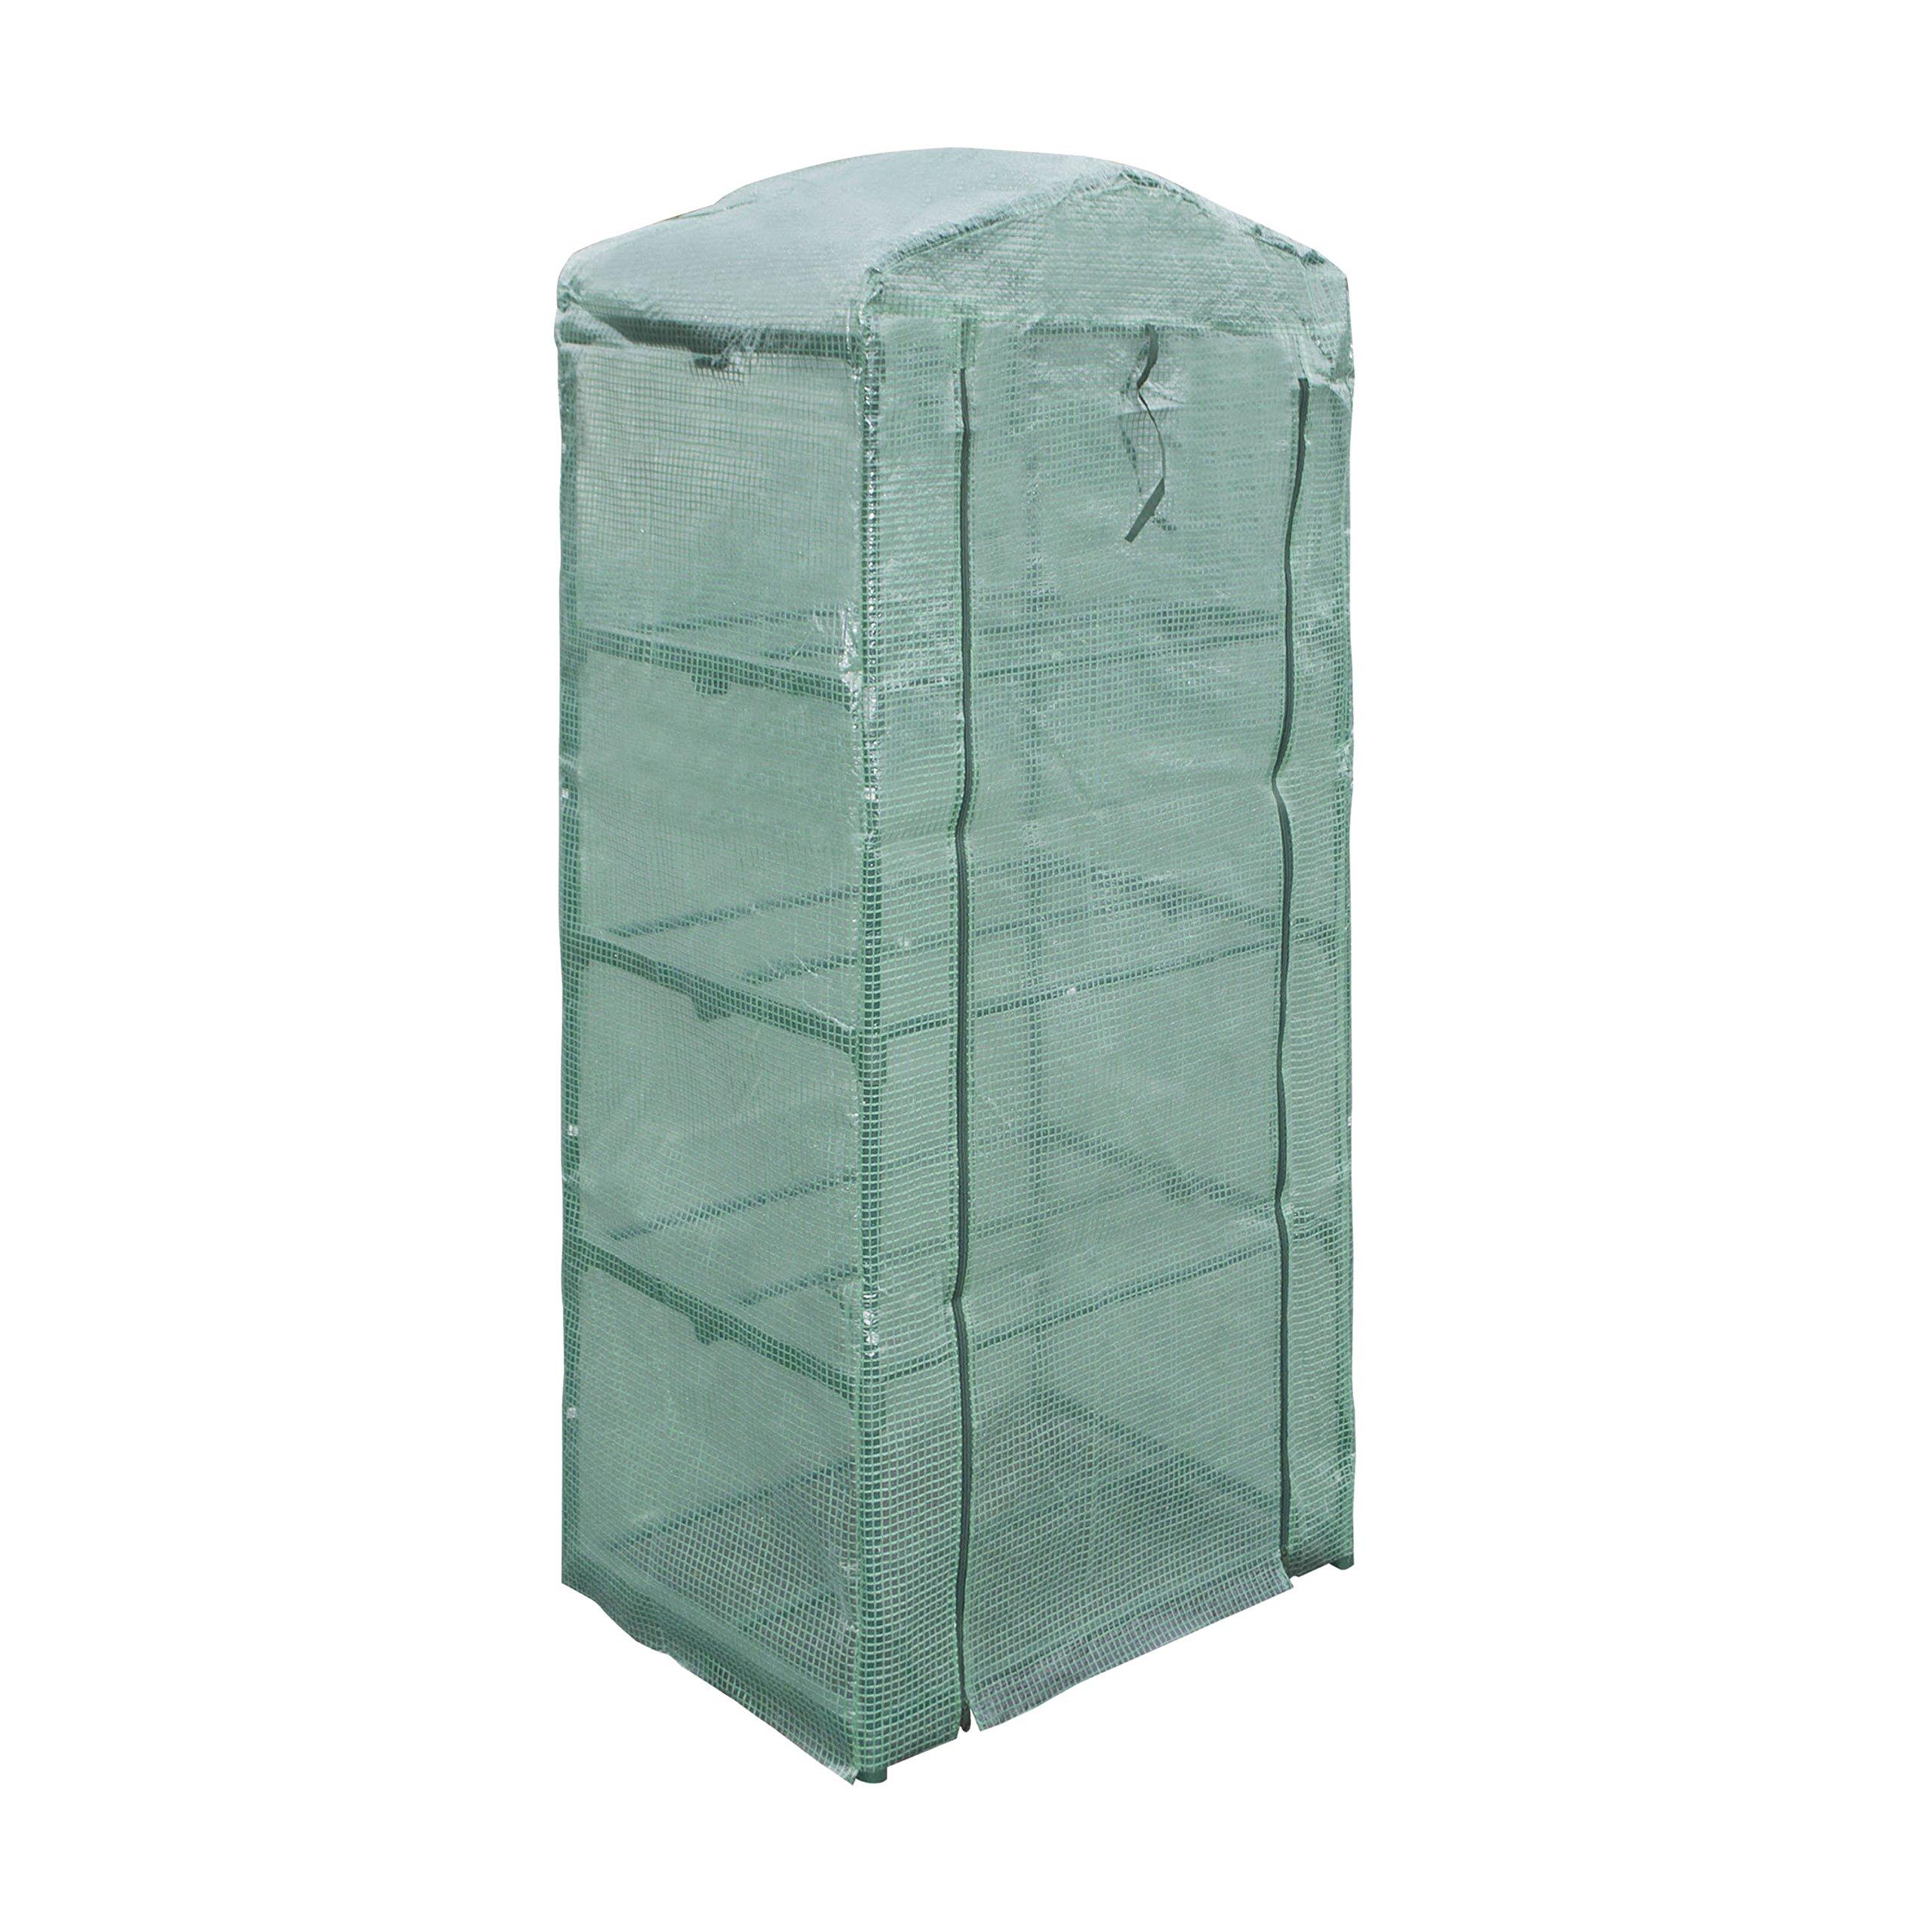 ALEKO GH27X19X63 Green Waterproof PE Mesh Cloth 4 Tier Plant Garden Outdoor Greenhouse Shed, 27'' L x 19'' H x 63'' W